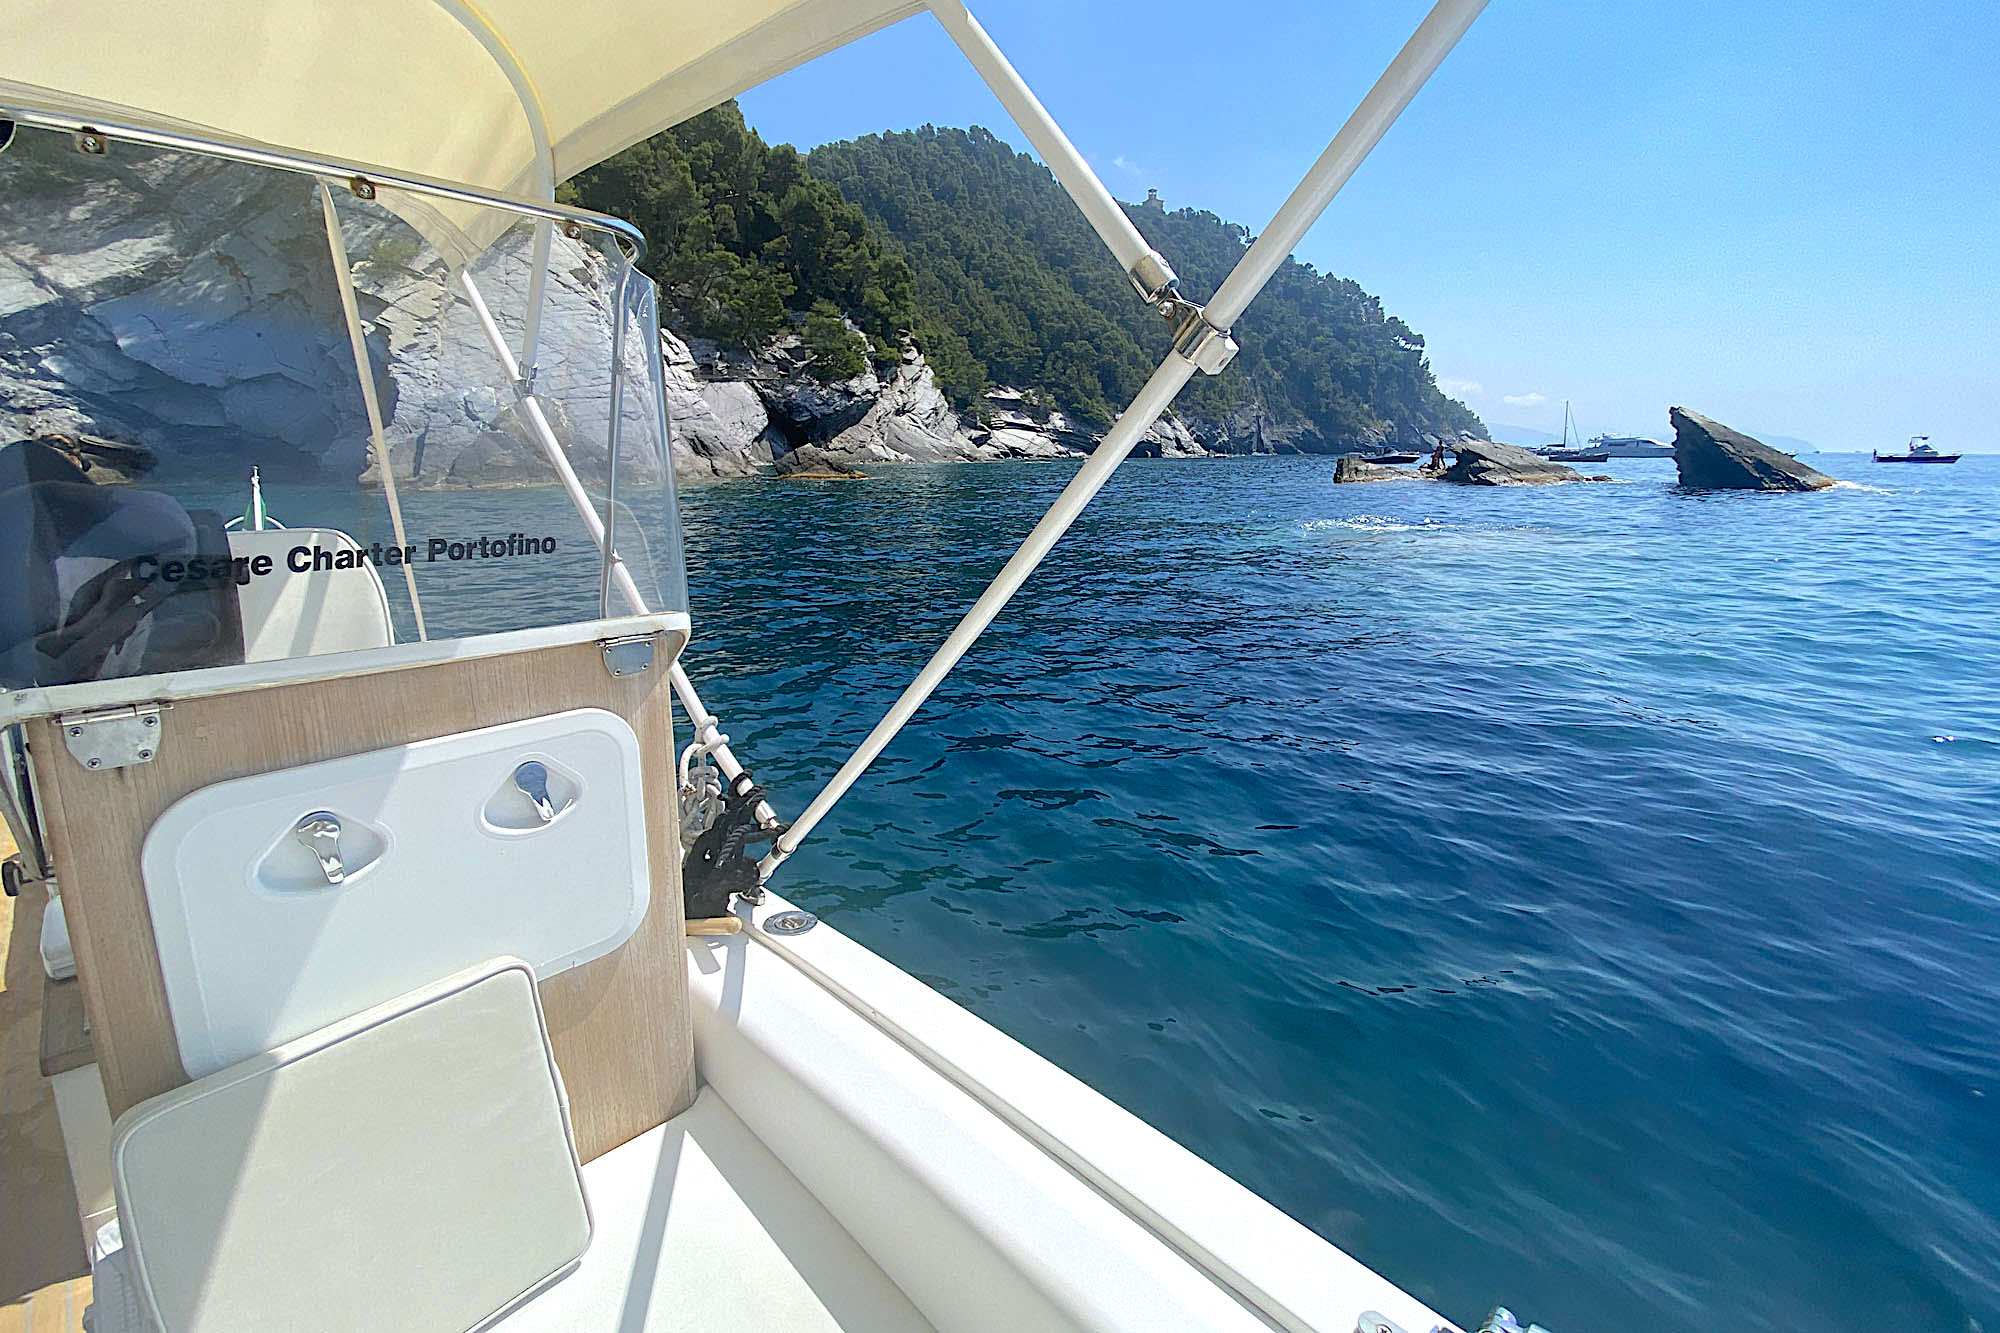 Cesare Charter Portofino - Tour Due Golfi, bagno e snorkeling